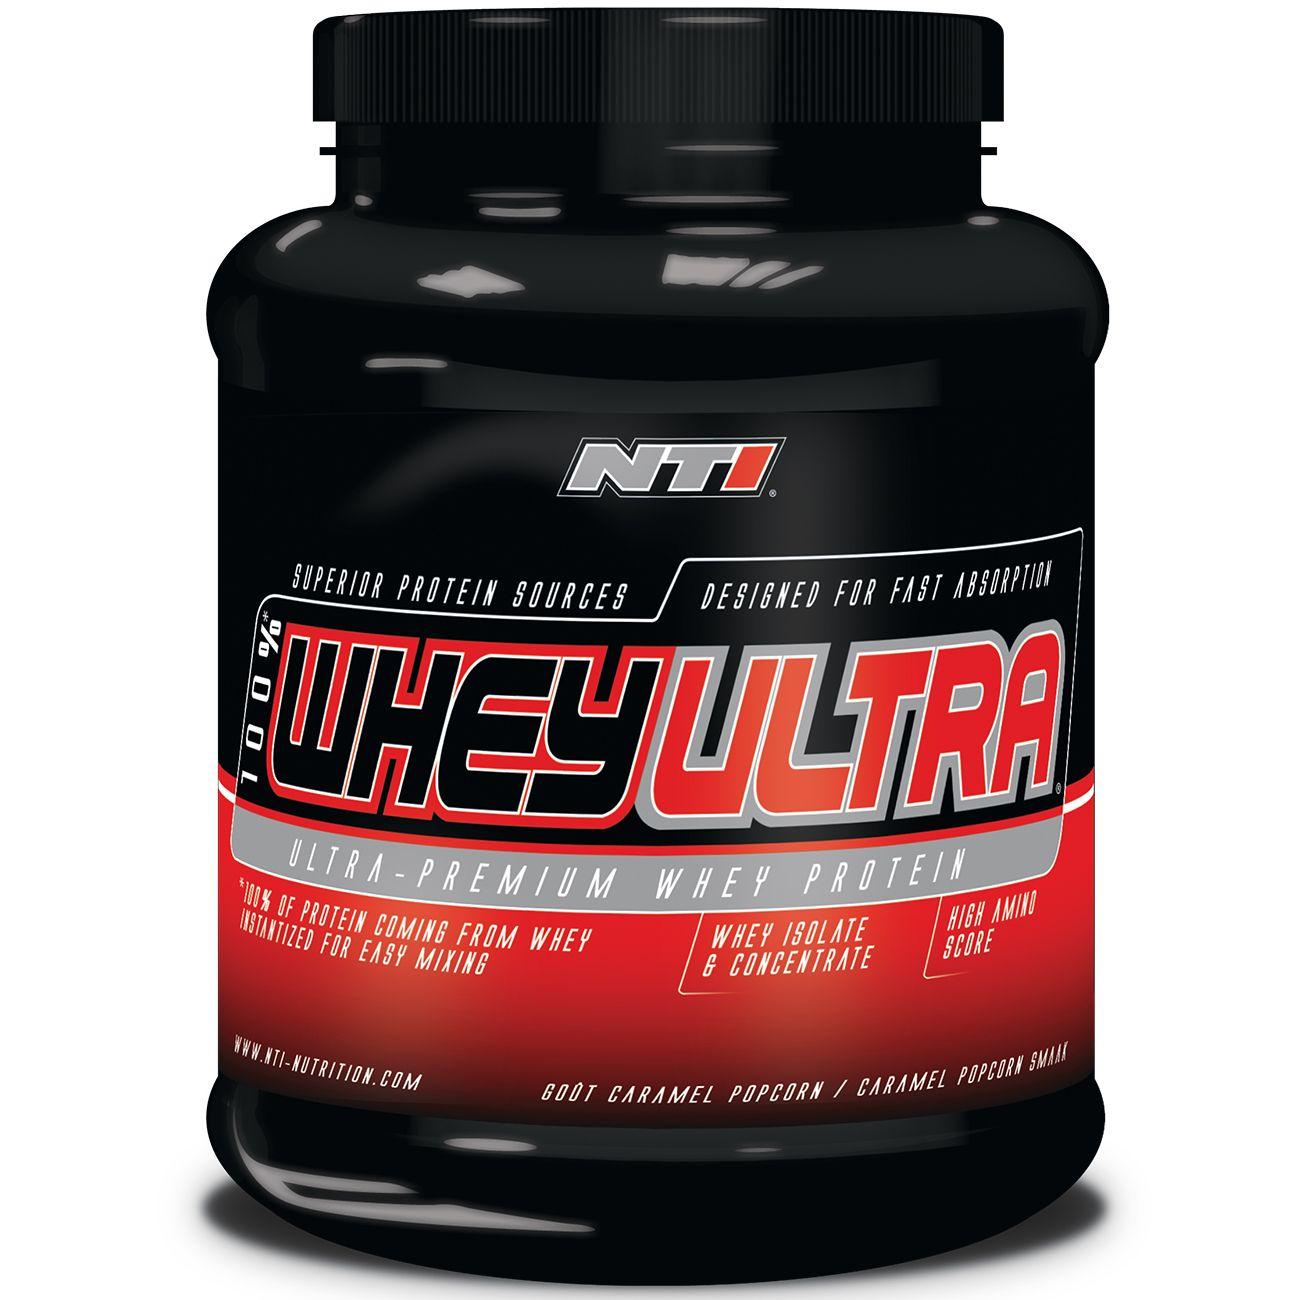 Prise de muscle Musculation  NTI NUTRITION 100% WHEY ULTRA